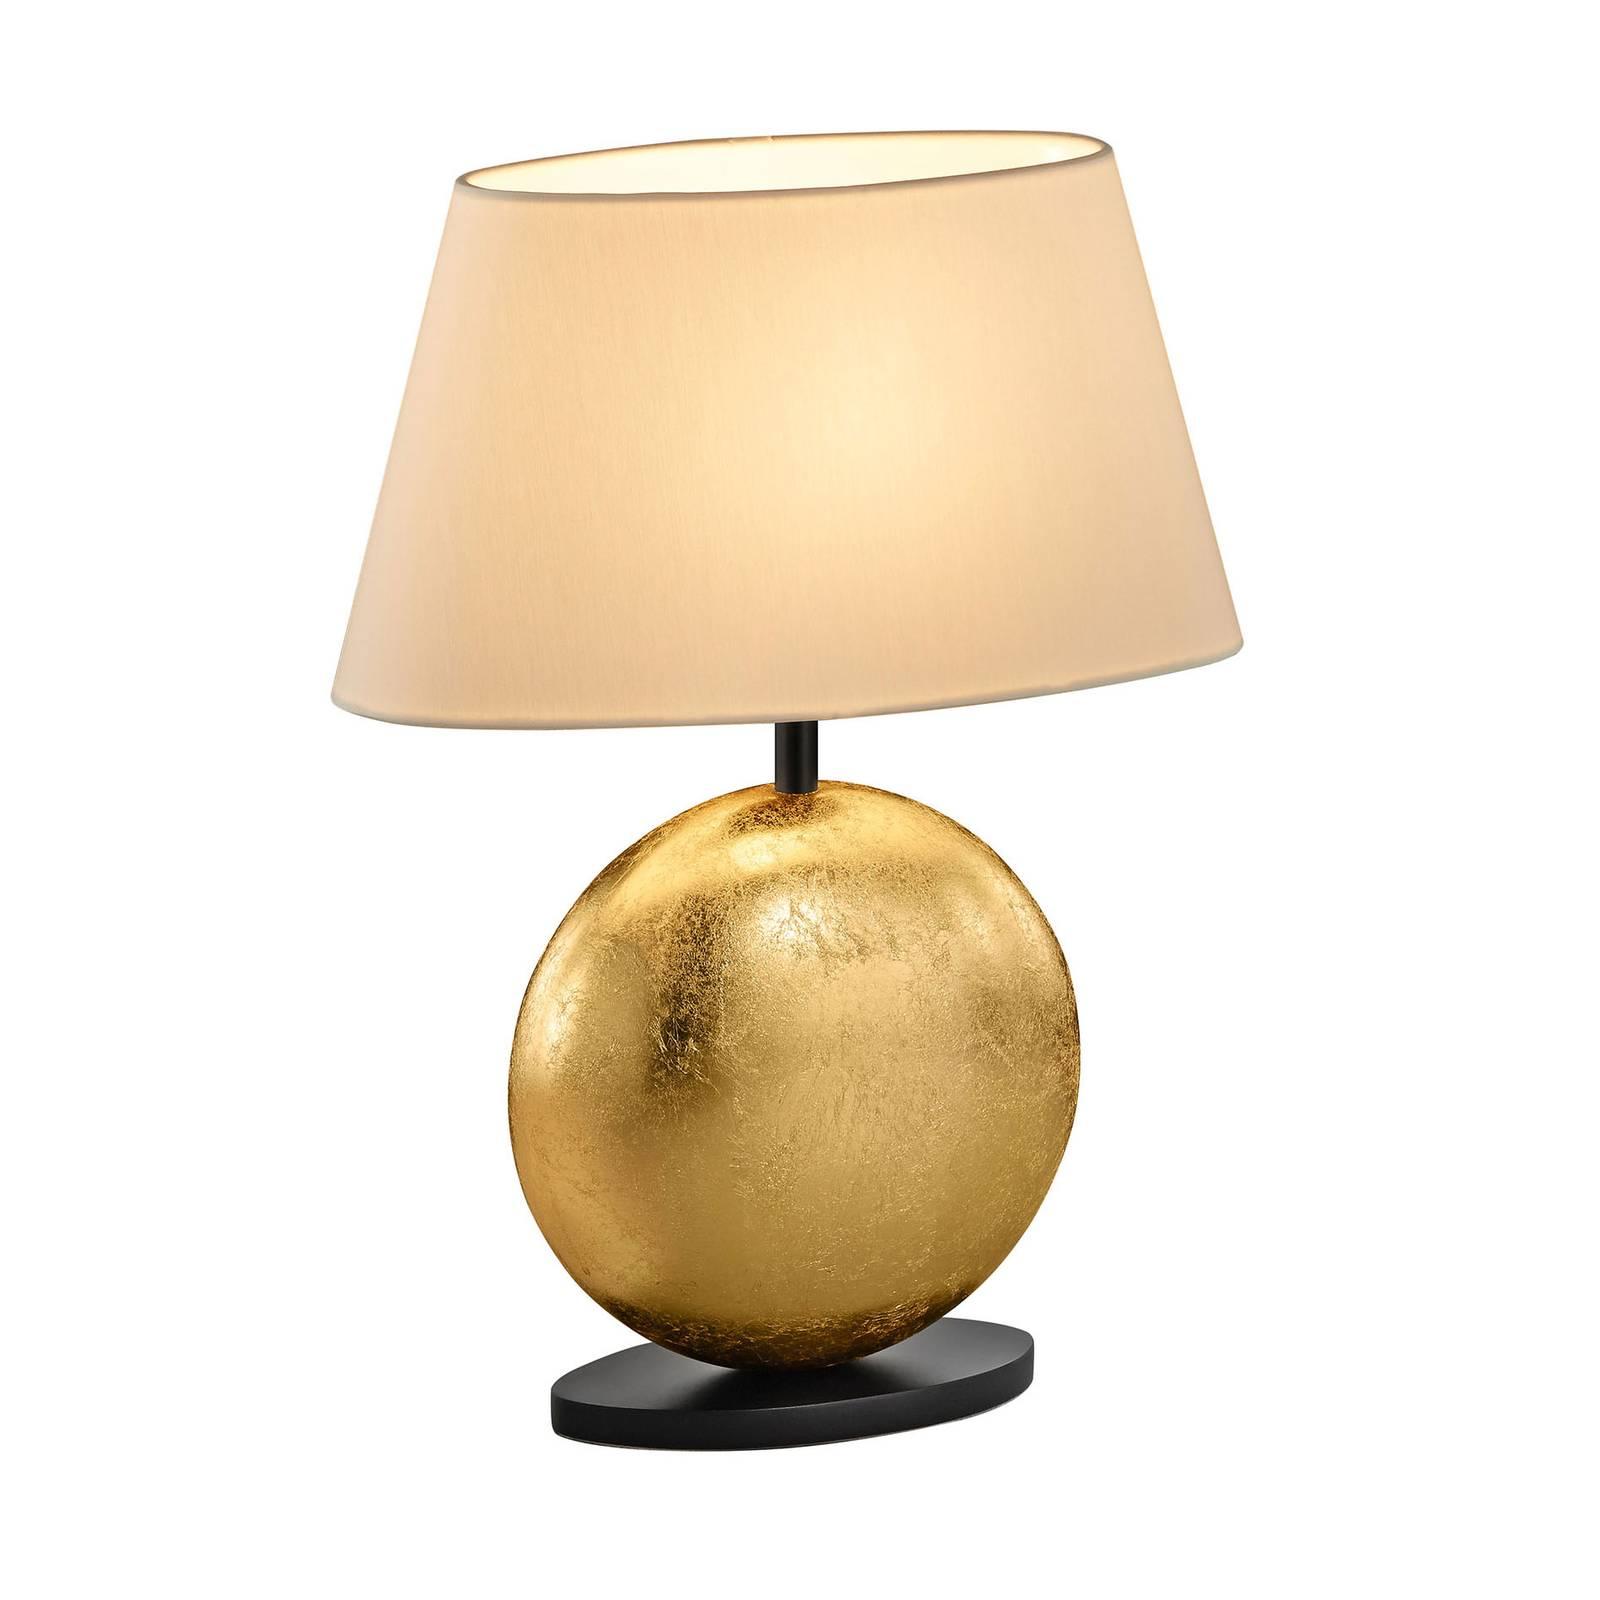 BANKAMP Mali lampe à poser, crème/doré, 41cm